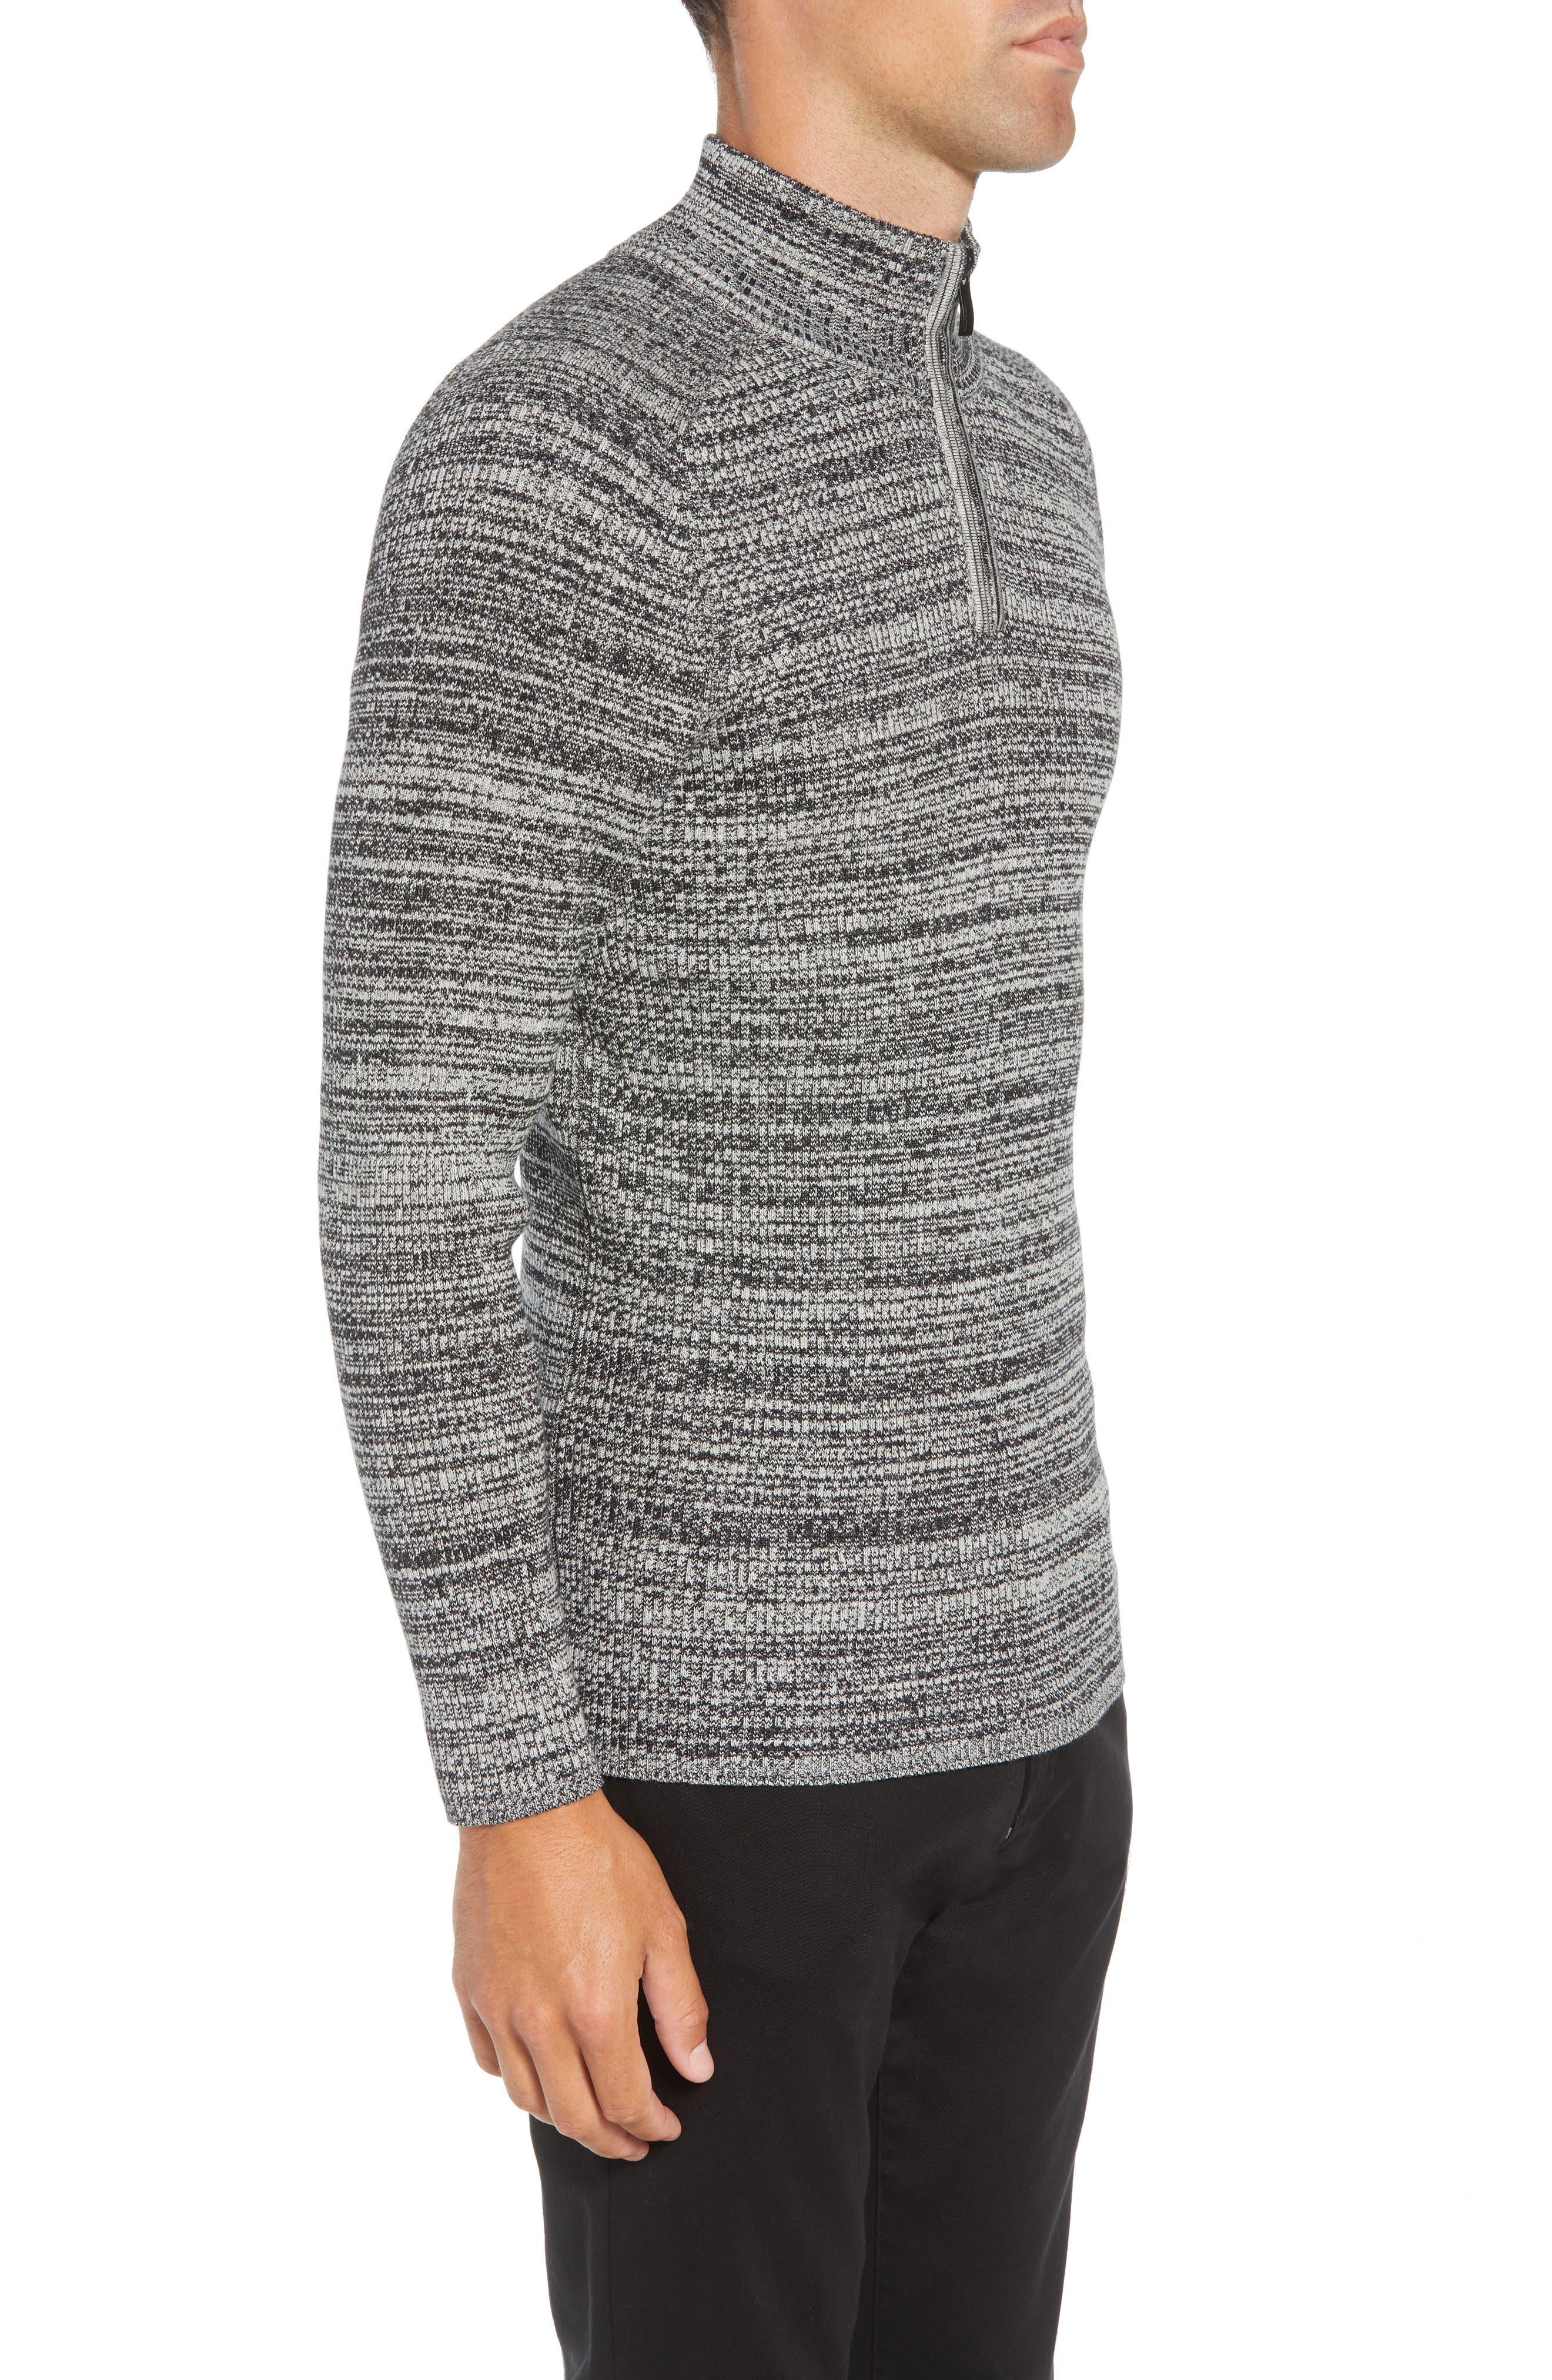 Vince Caumto Quarter Zip Mock Neck Sweater,                             Alternate thumbnail 3, color,                             GREY